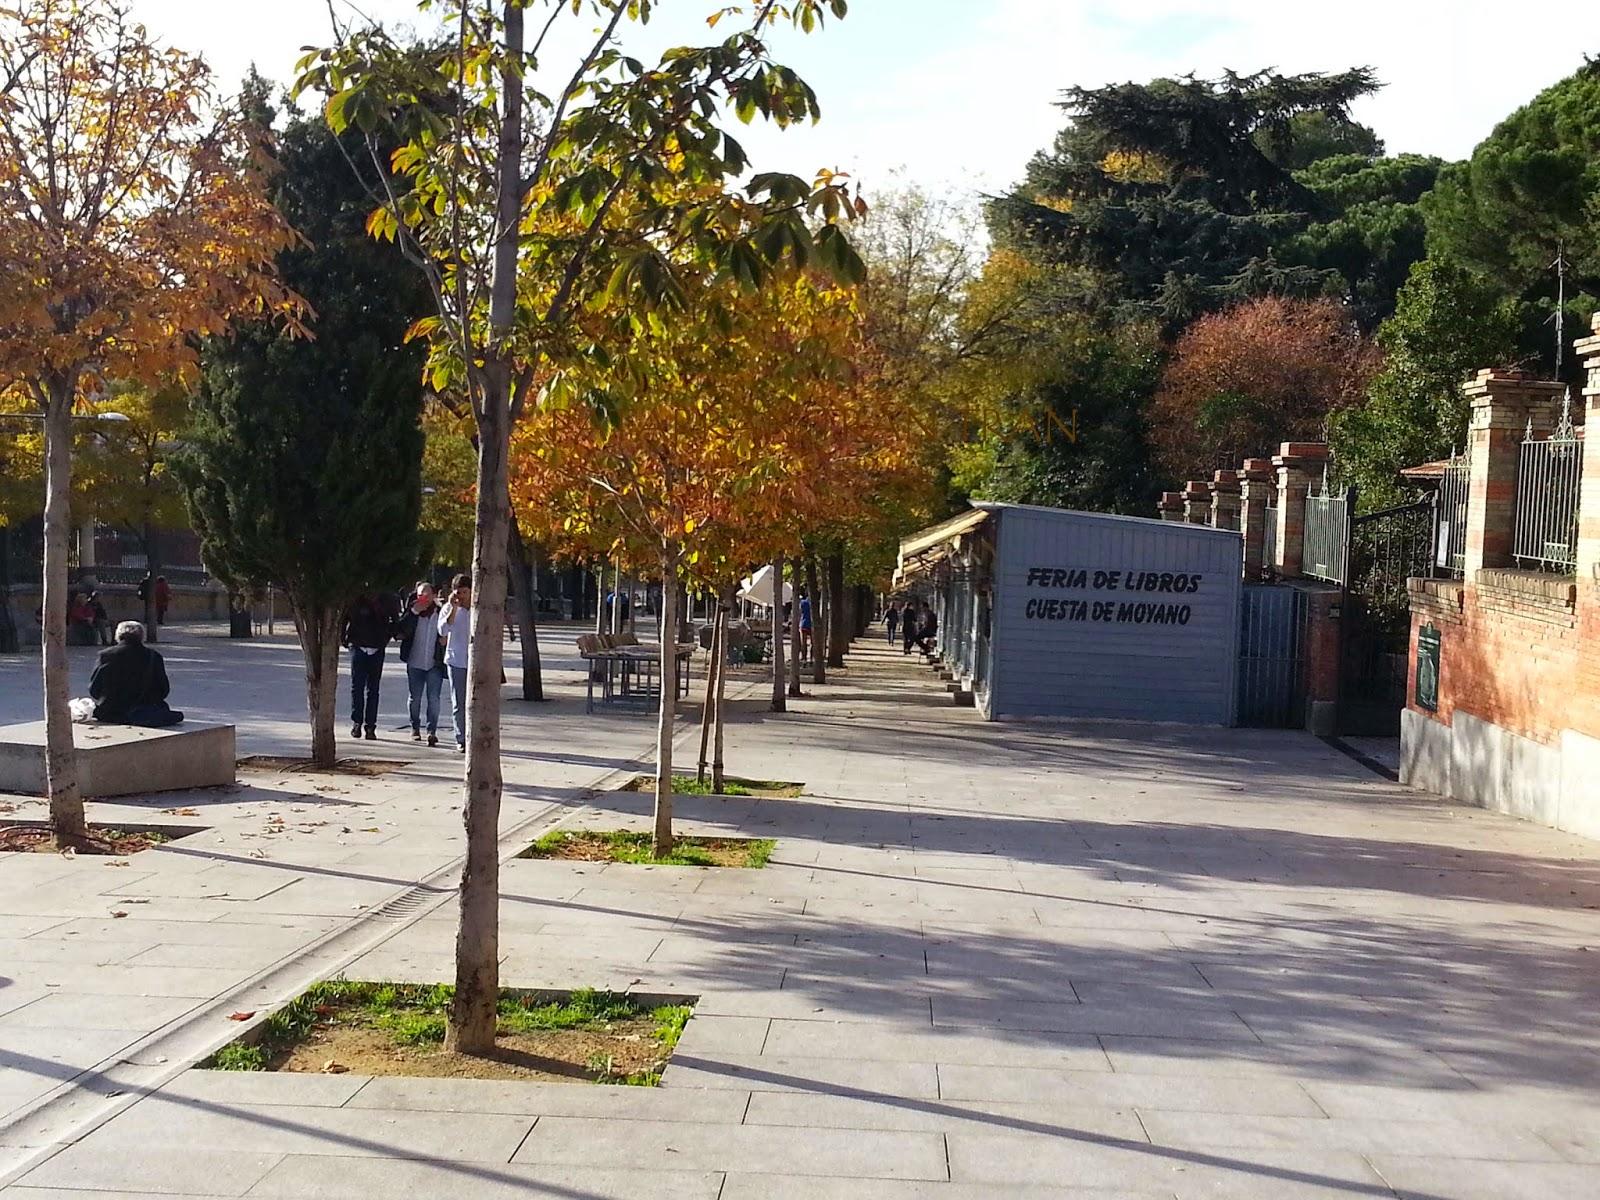 El Retiro en Otoño. Madrid me mata... pero no siempre.